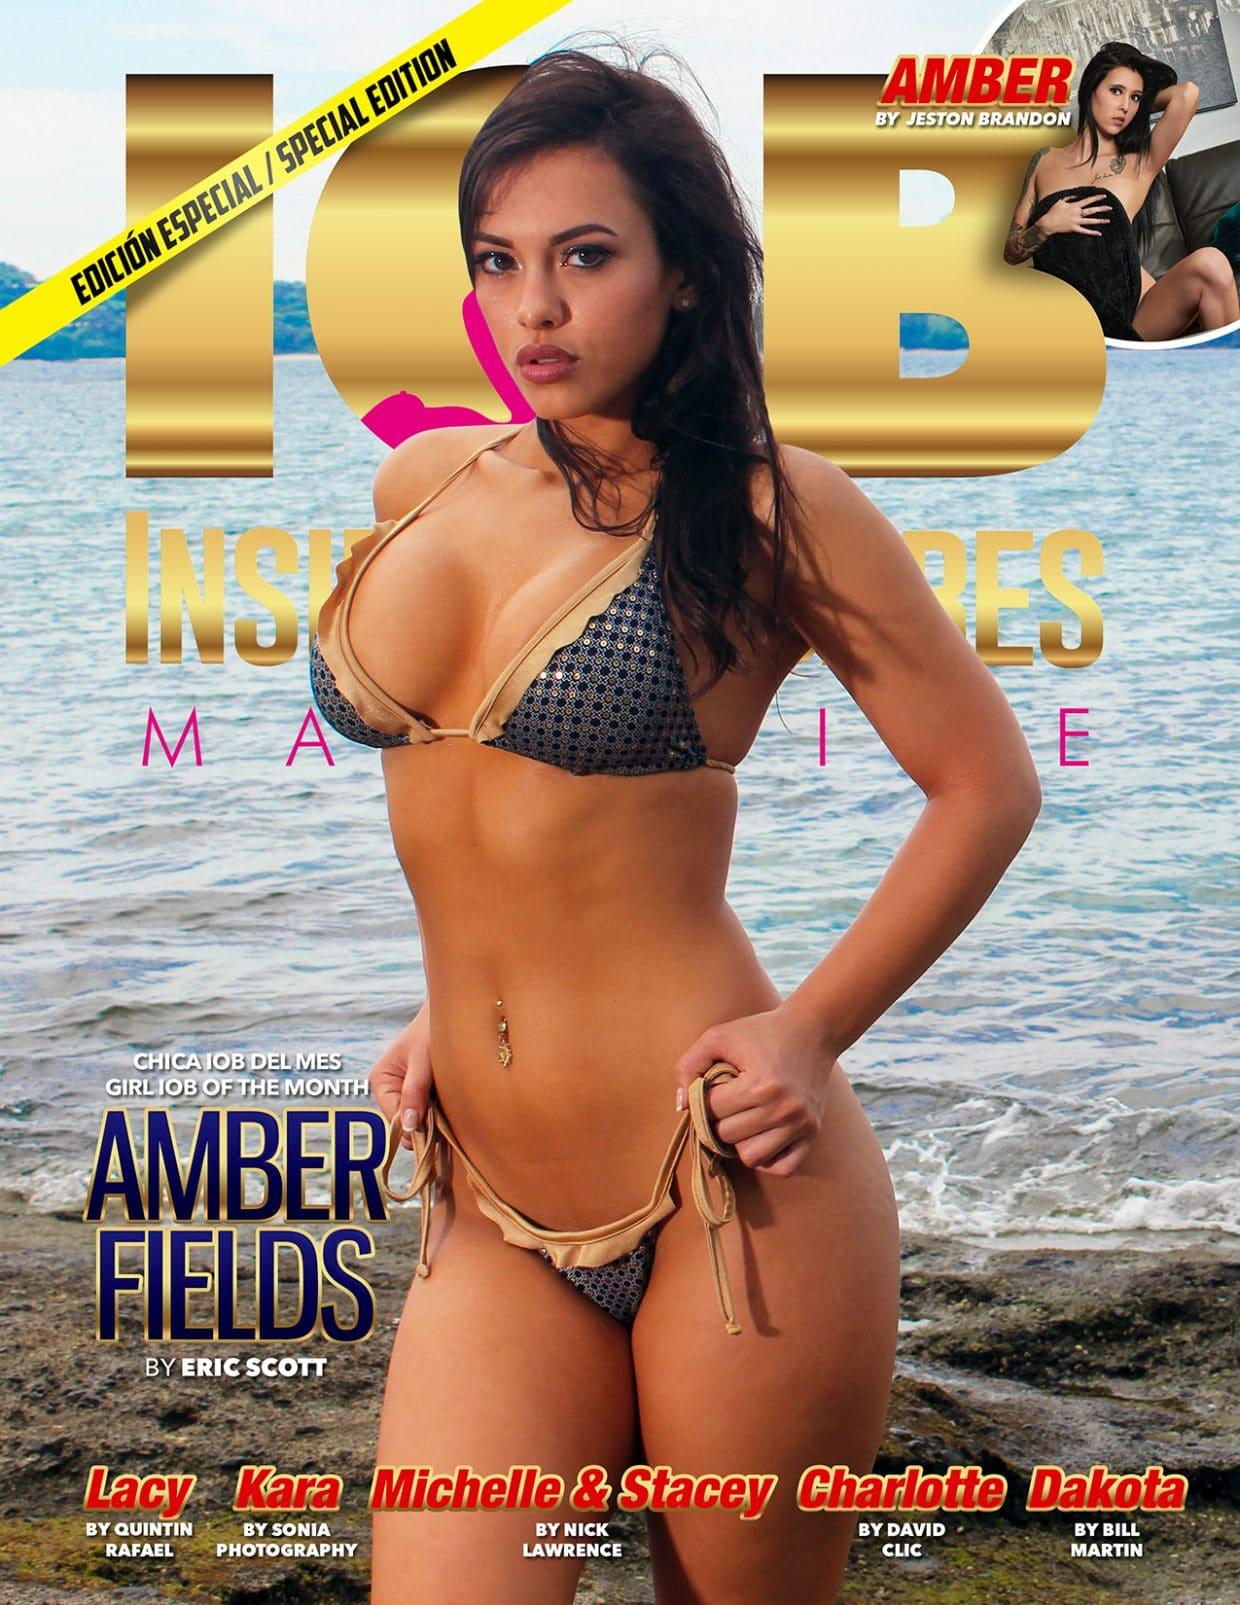 IOB Magazine – Special Edition – July 2017